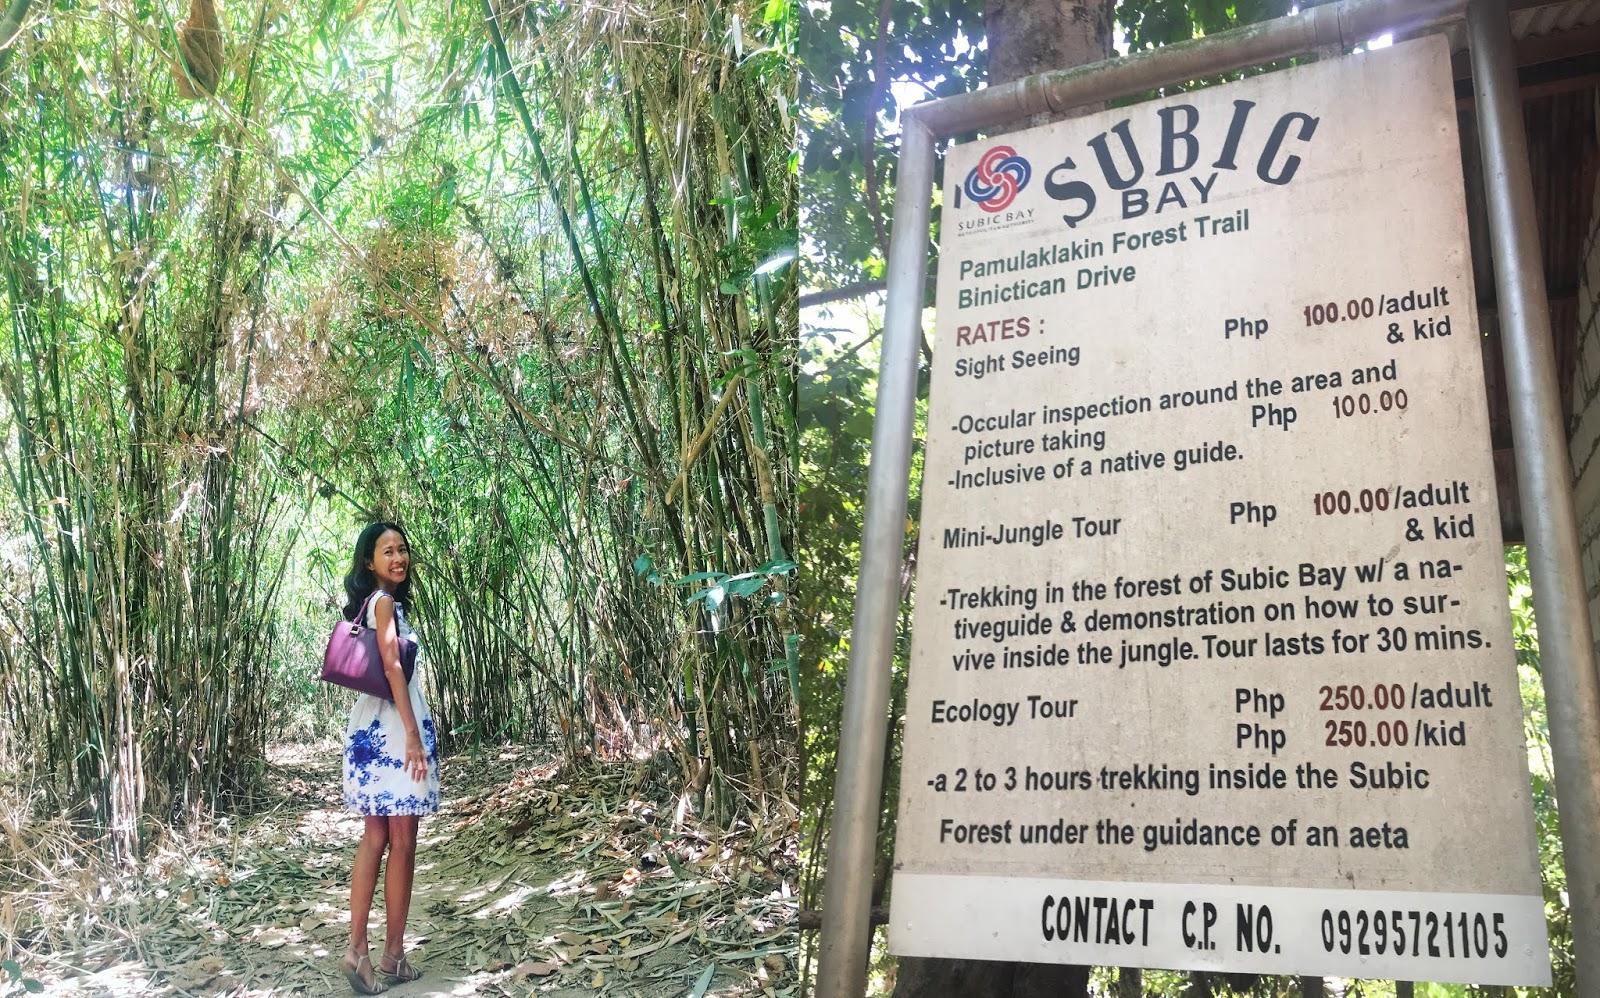 PAMULAKLAKIN FOREST TRAIL SUBIC BAY